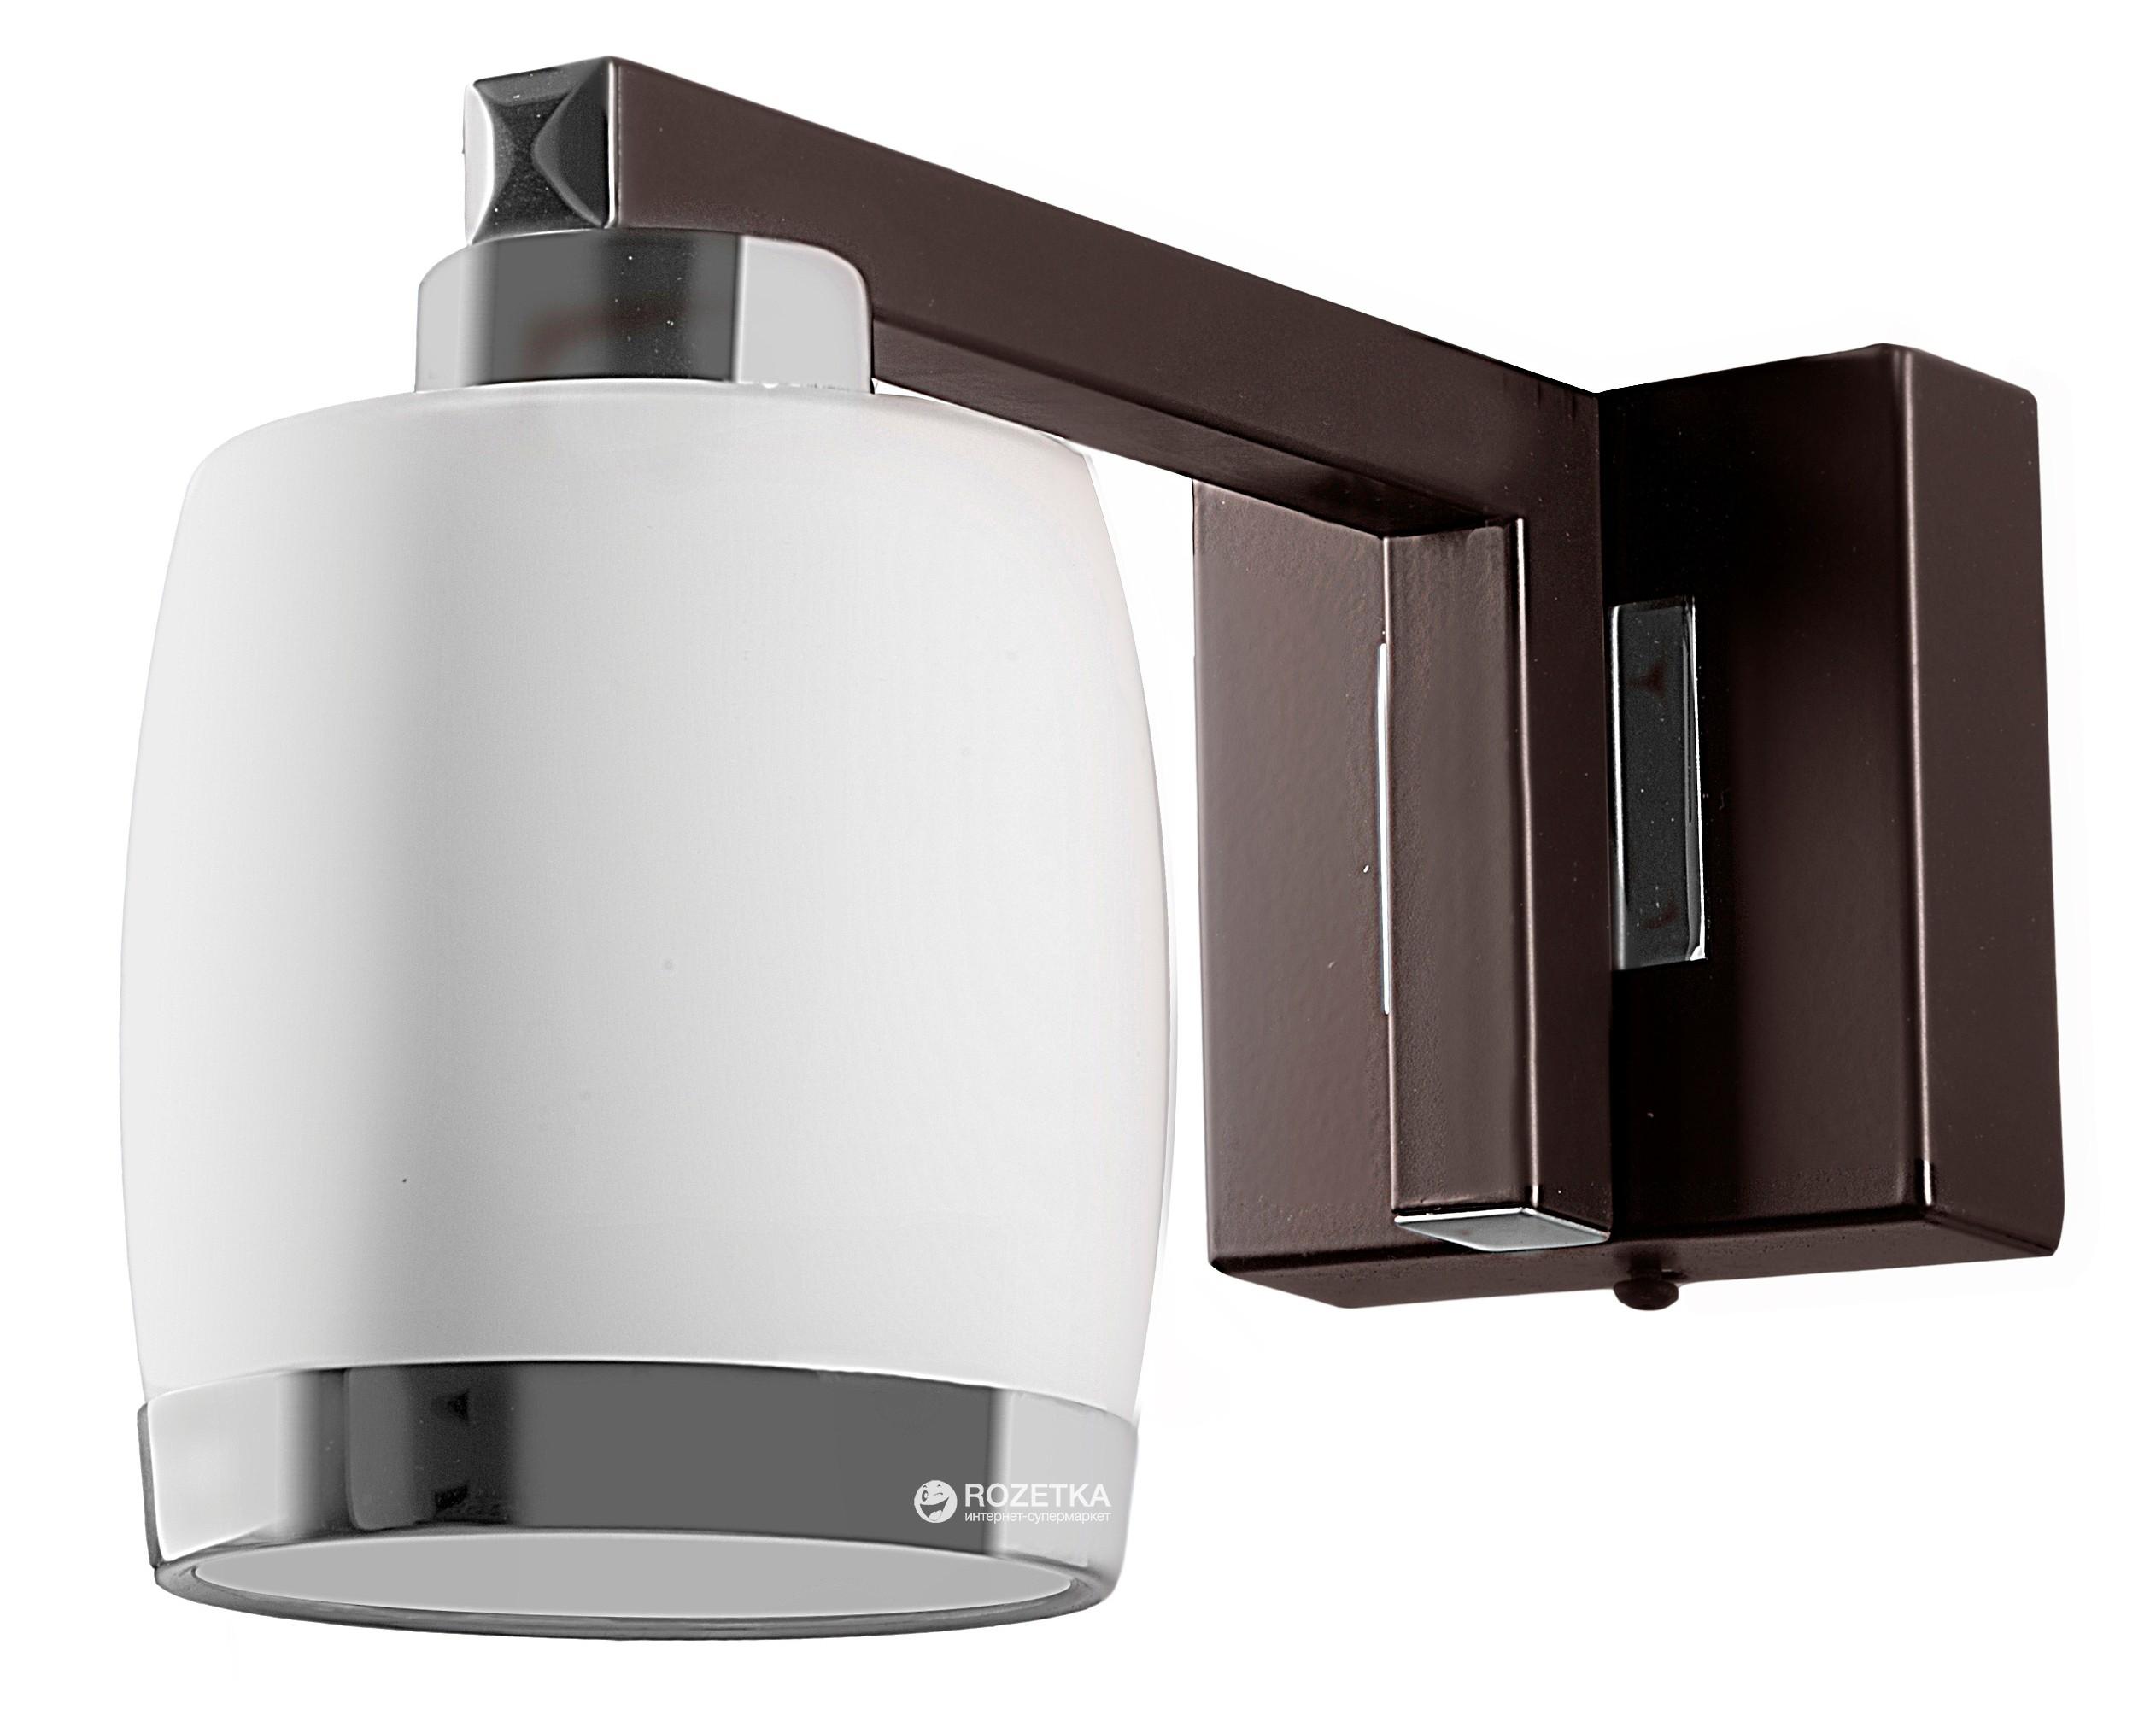 Plafoniere Ieftine : Lustra cu ventilator ieftina: